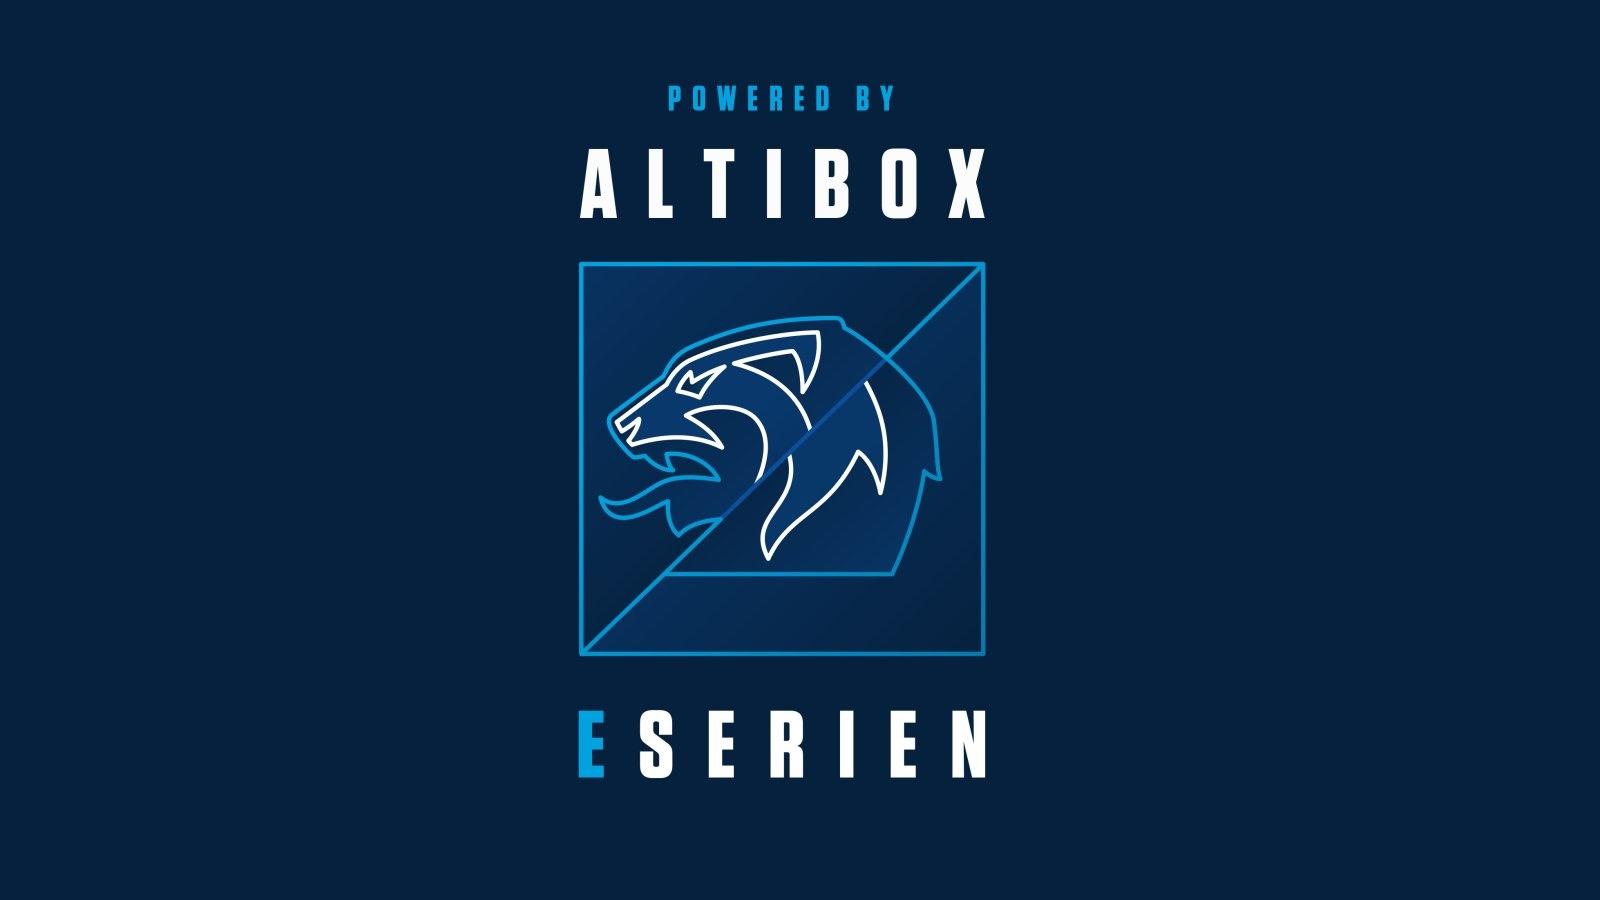 156 07 Eserien logo altbox